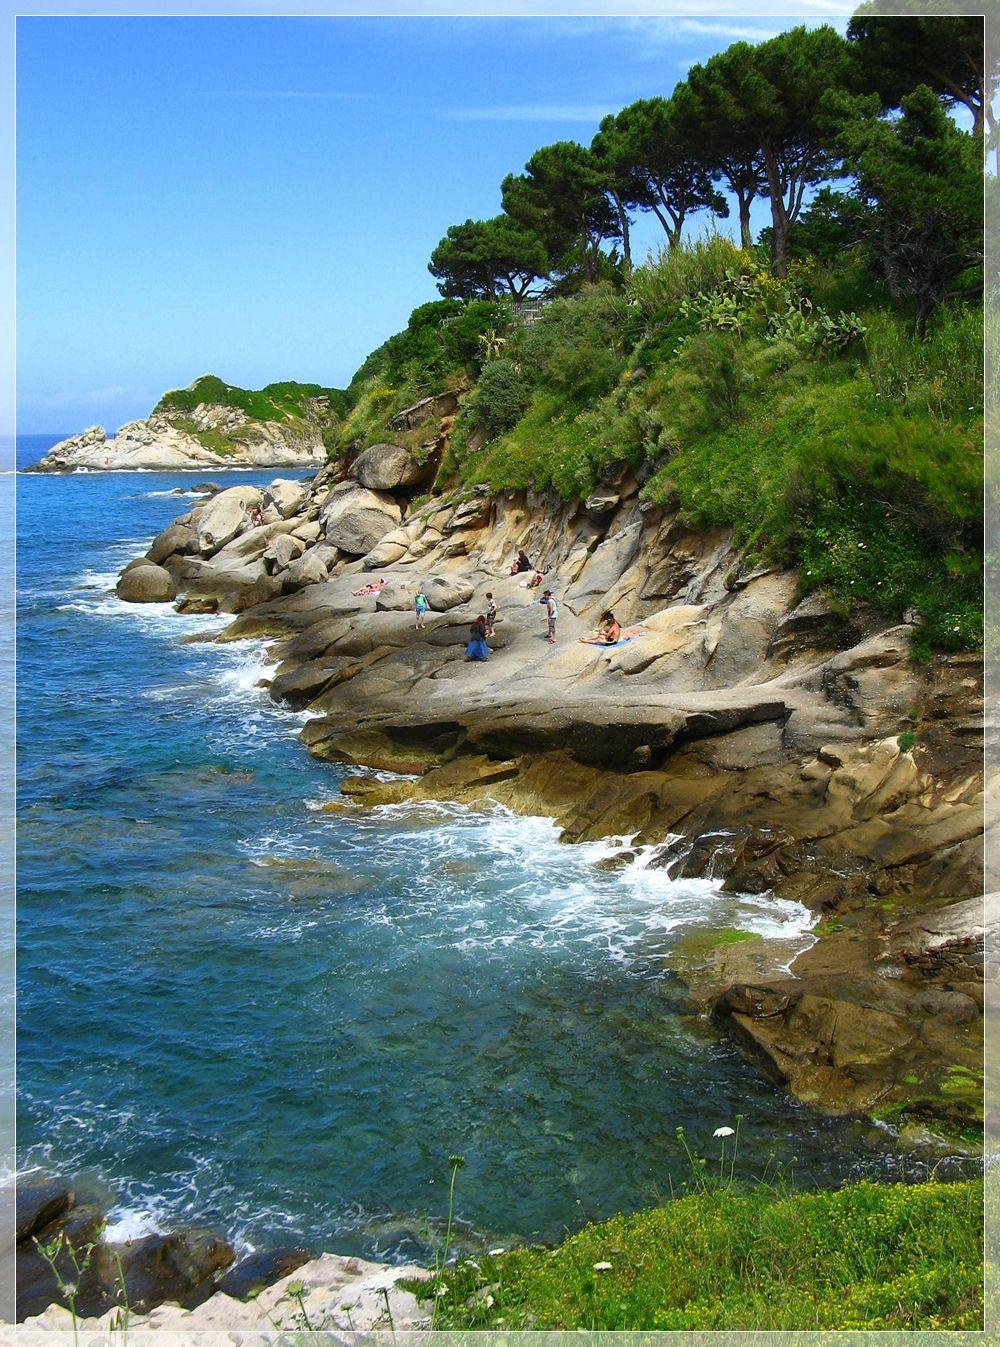 La costa selvaggia del marcianese Marciana, Isola d'Elba, Tuscany #luxury #destination #weddingdestination #isoladelba #discoverelba #discovertuscany #island #elba #tuscany